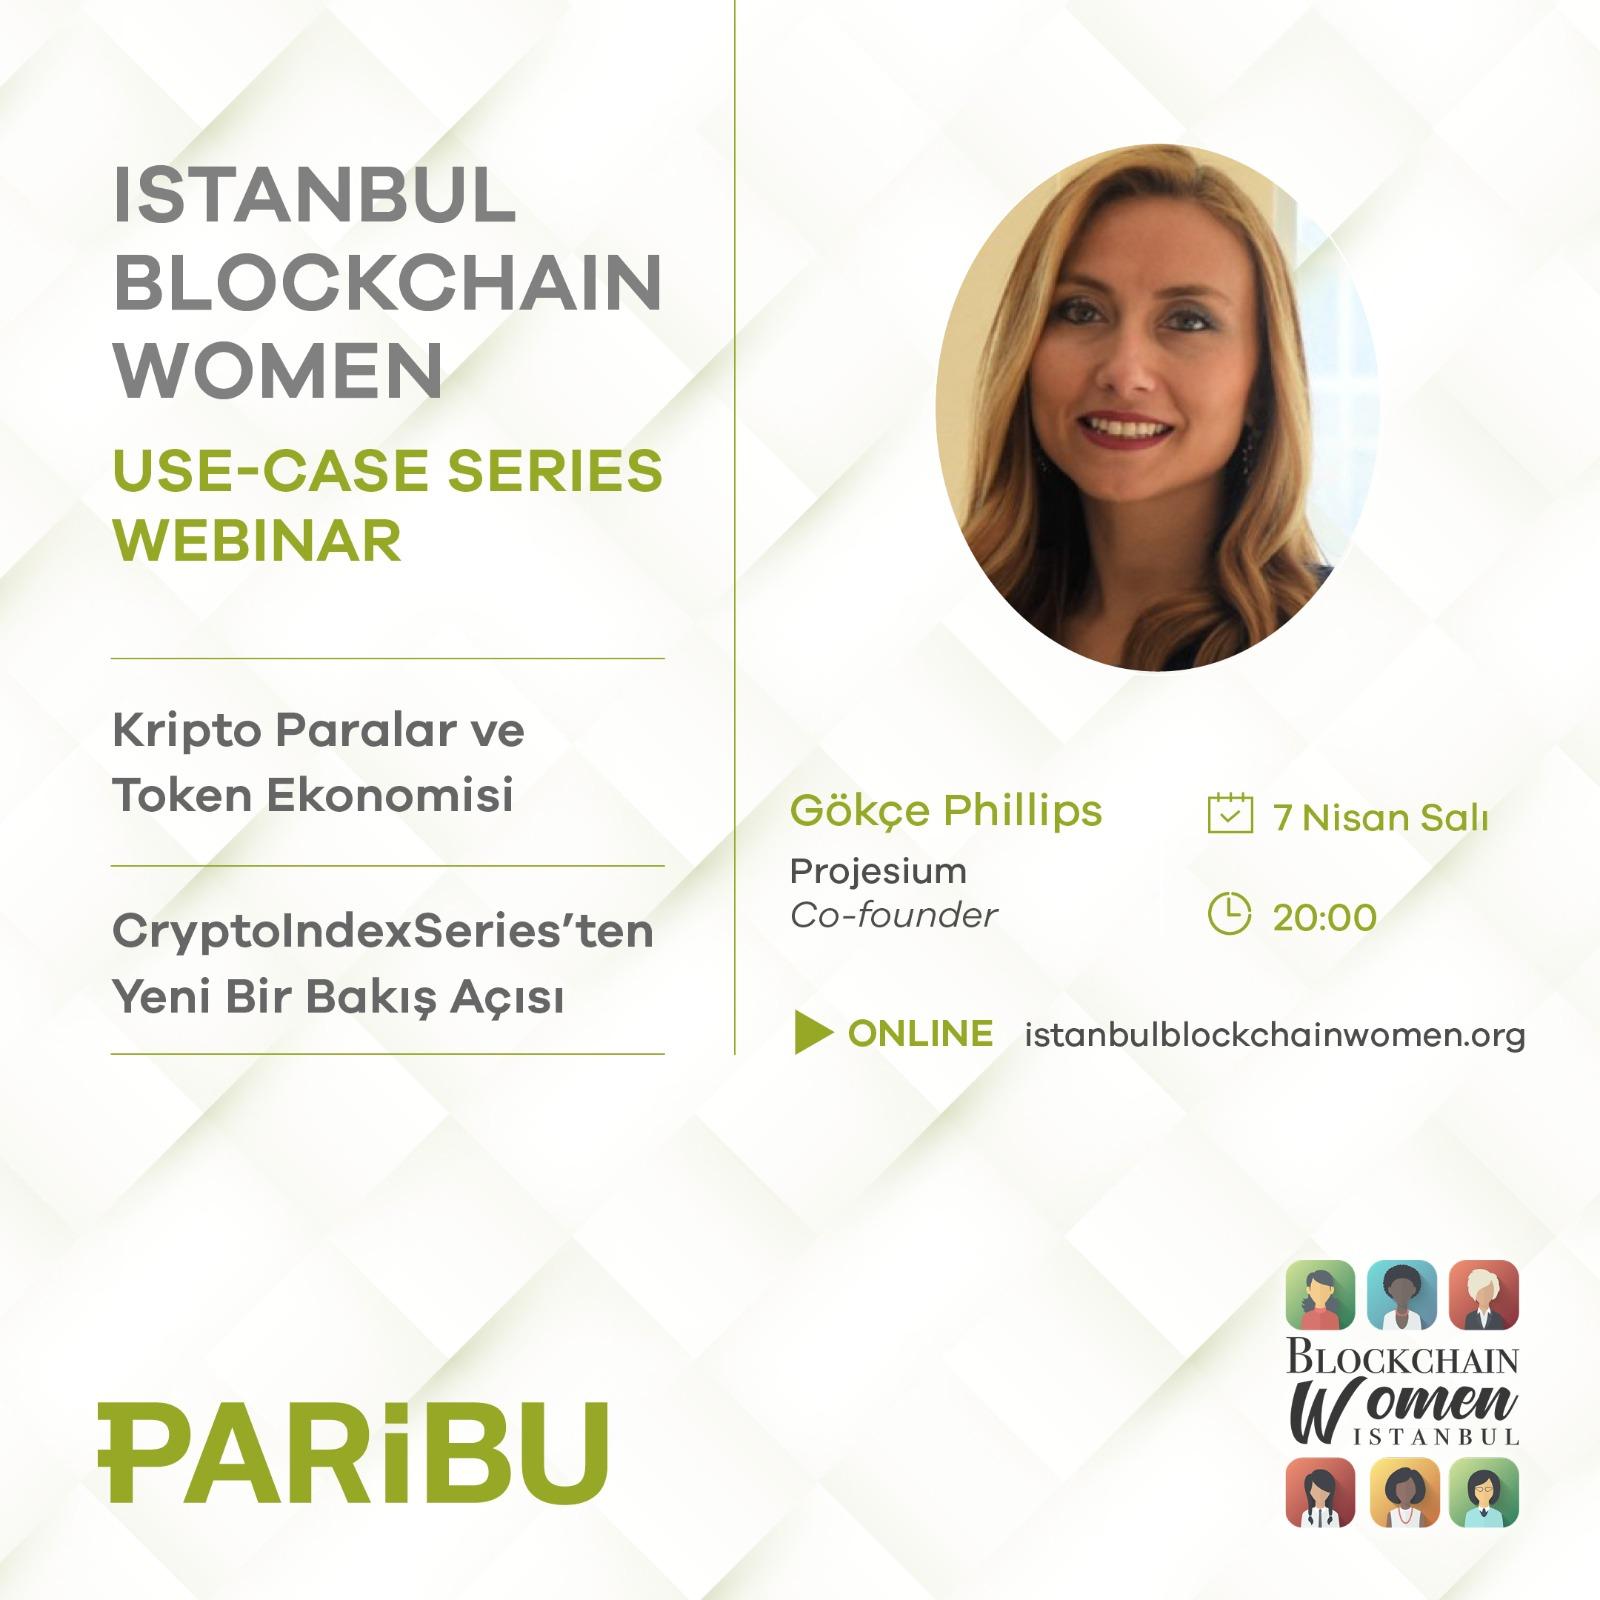 Blockchain Use-Case Series with Paribu